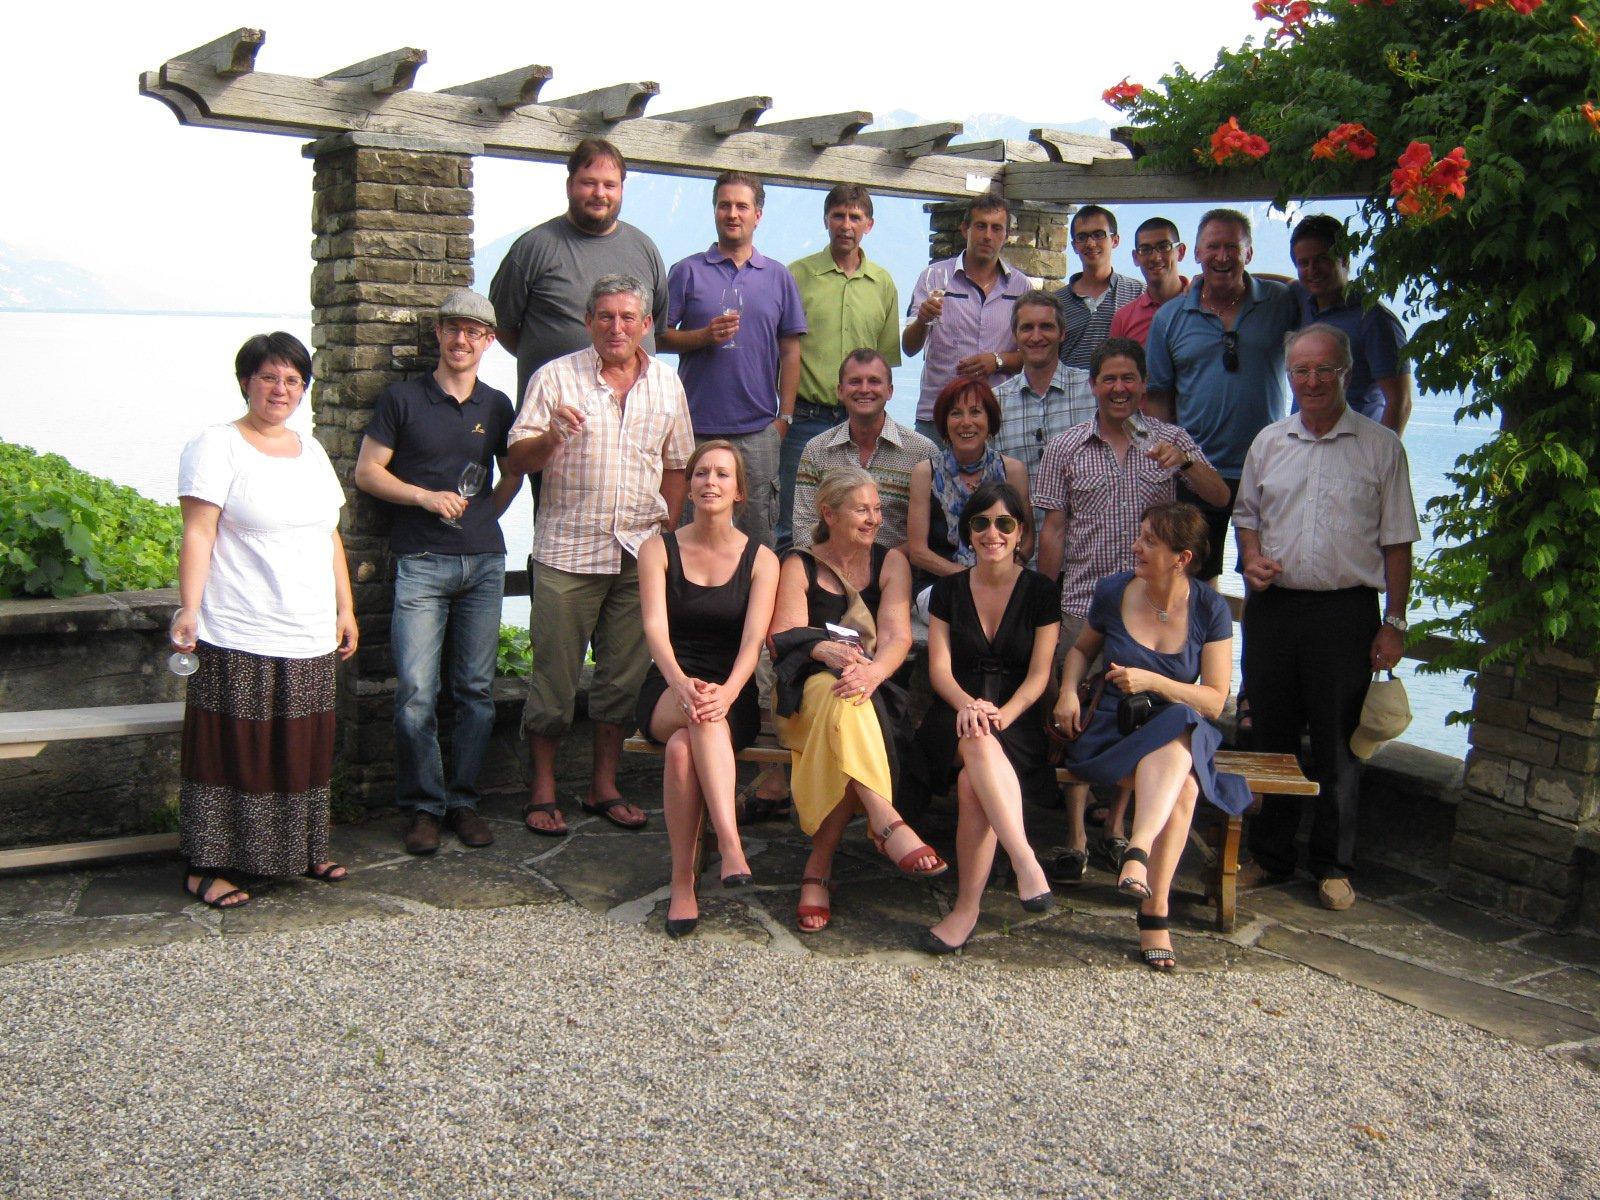 Lavaux, luglio 2010